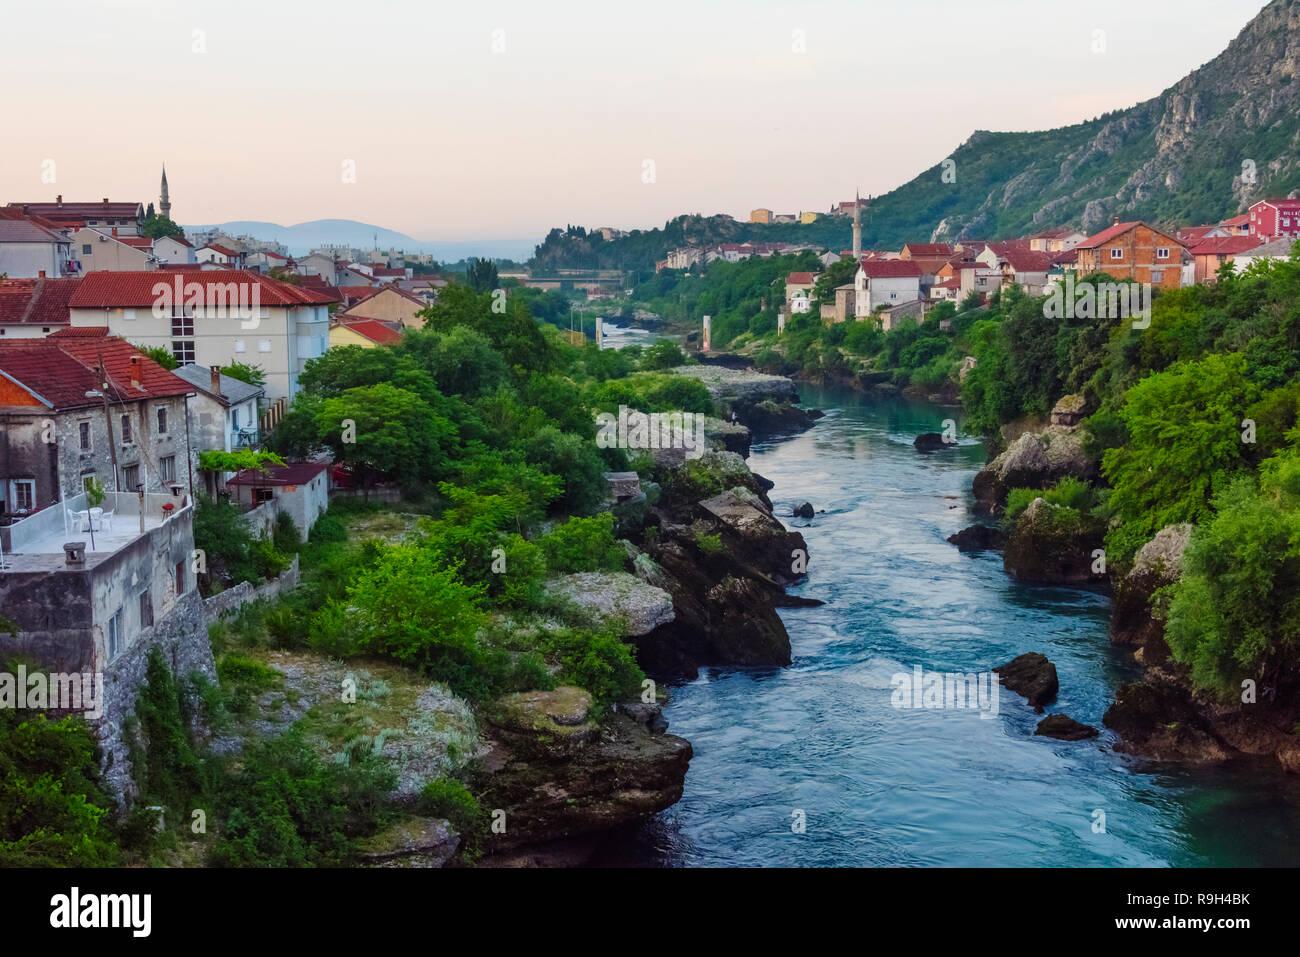 Houses along the Neretva River, Mostar, Bosnia and Herzegovina - Stock Image